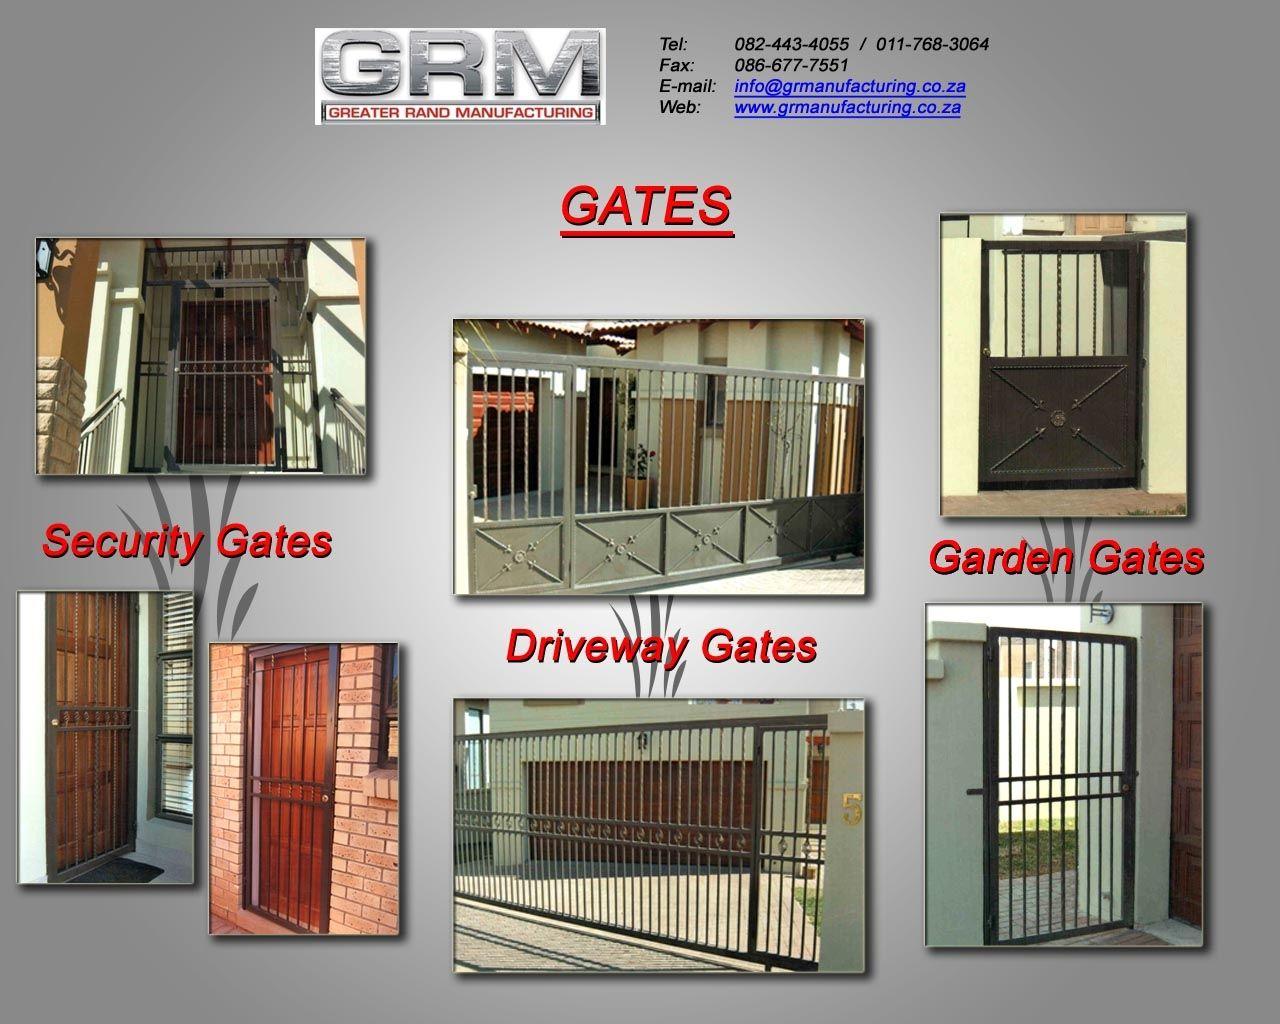 Security Gates For Doors Jhb Httpfranzdondicom Pinterest  74e109a5851fc9e3595e11baa3c0e628 716494621939920173. Interior Security  Gates Interior Security